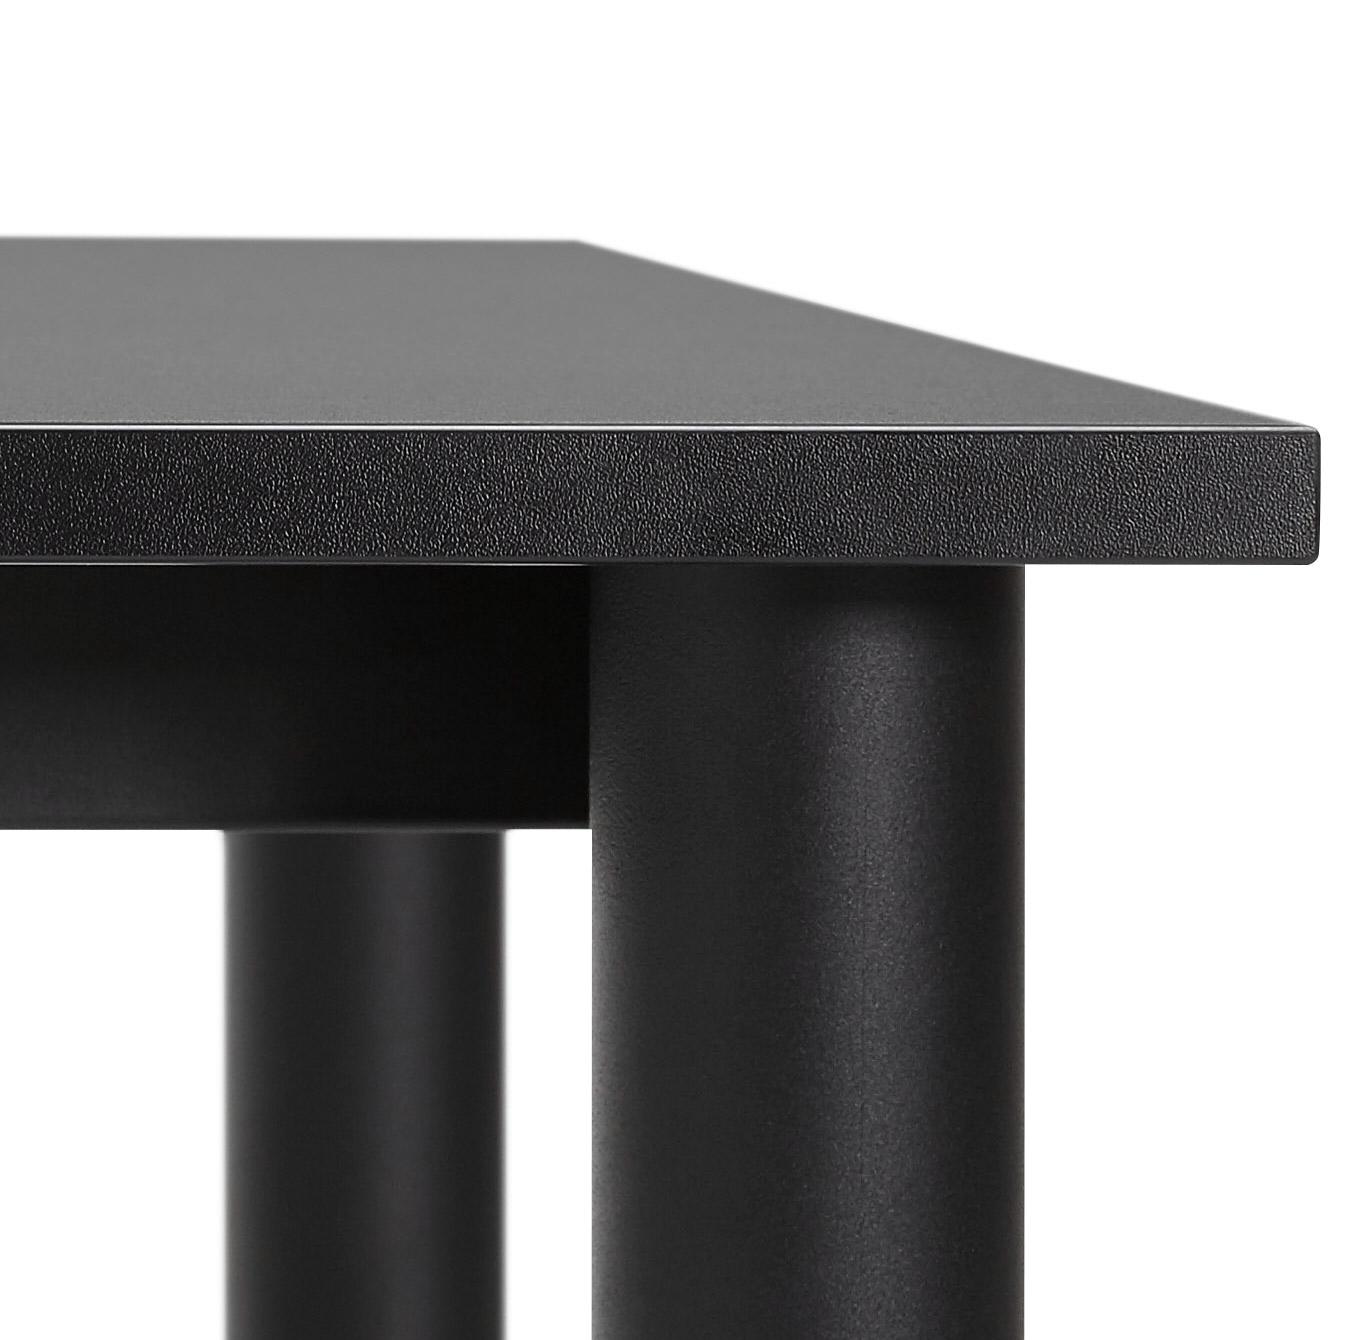 zwart design bureau focus vergadertafel 160x80 cm. Black Bedroom Furniture Sets. Home Design Ideas